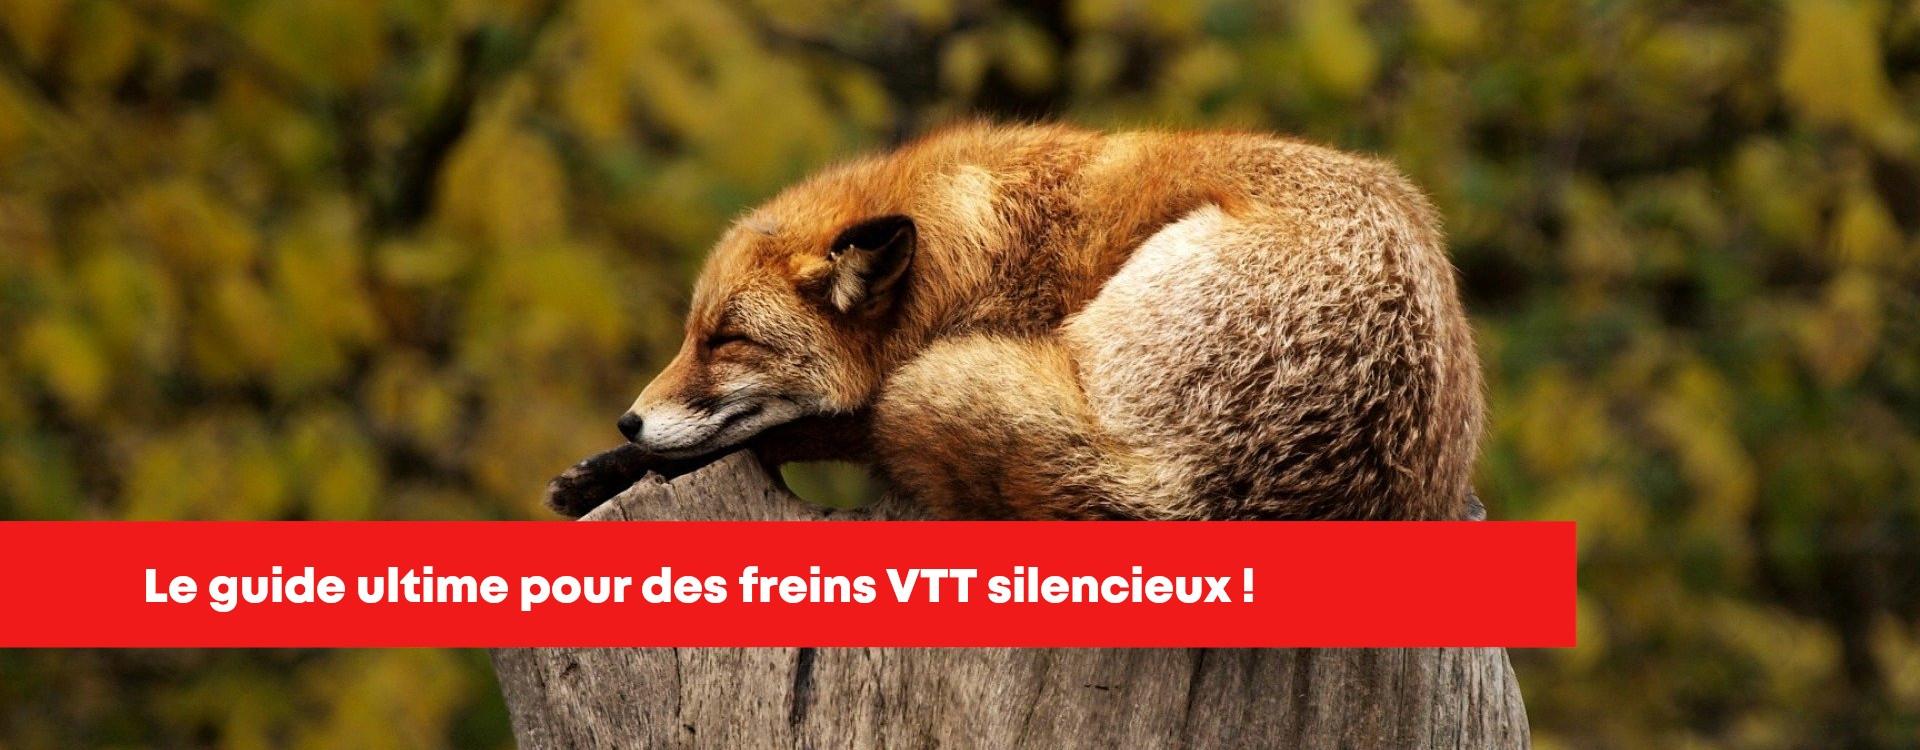 Freins à disque VTT bruyant, STOP!